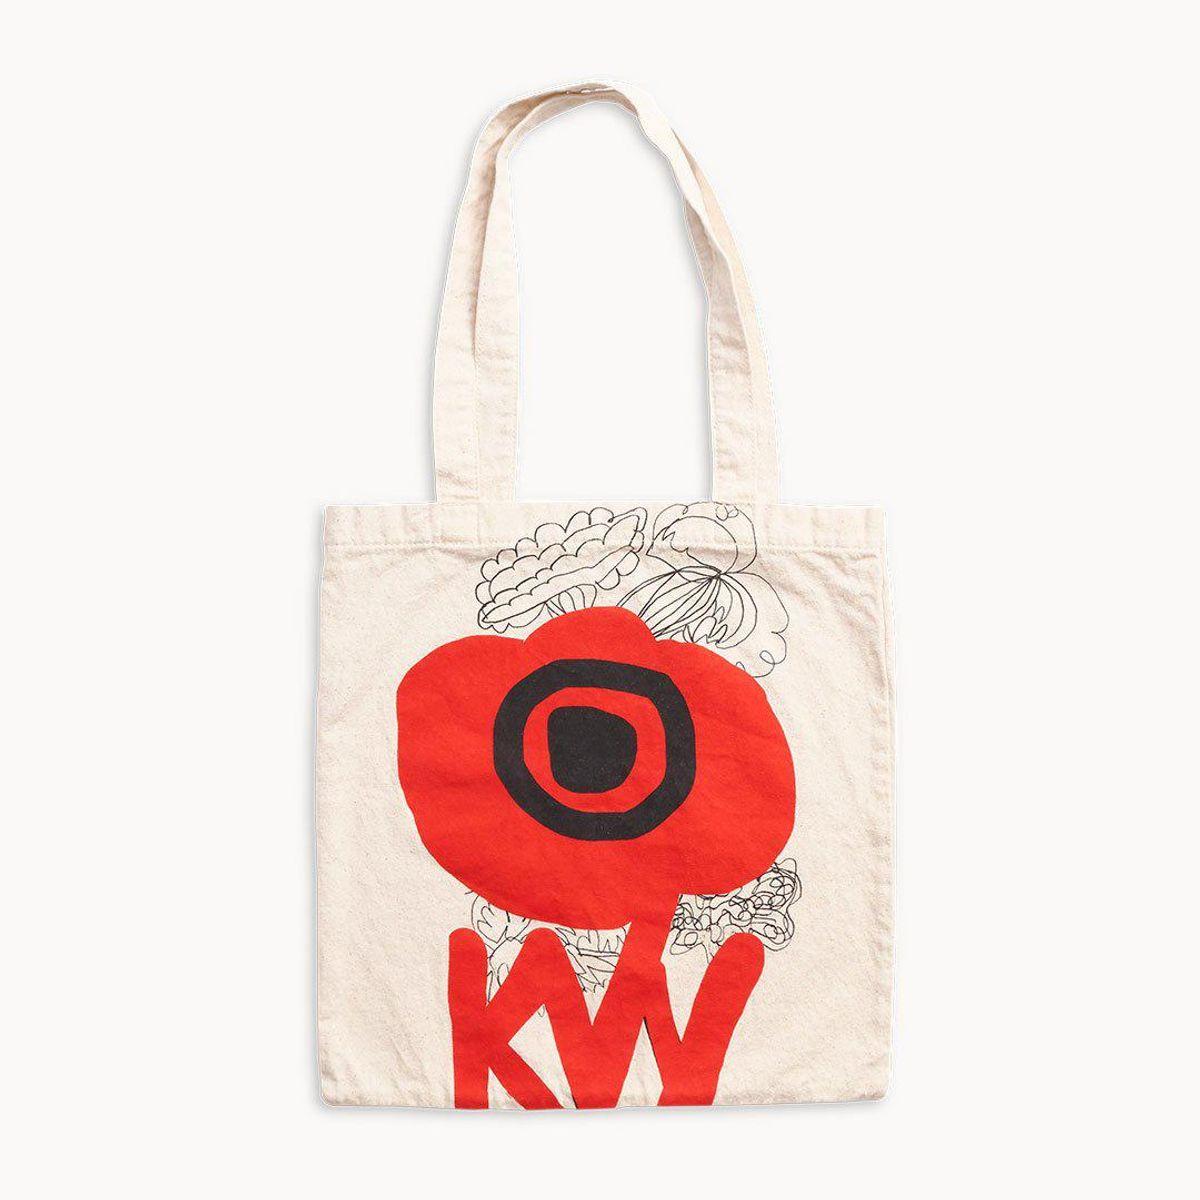 kjaer weis anniversary tote bag